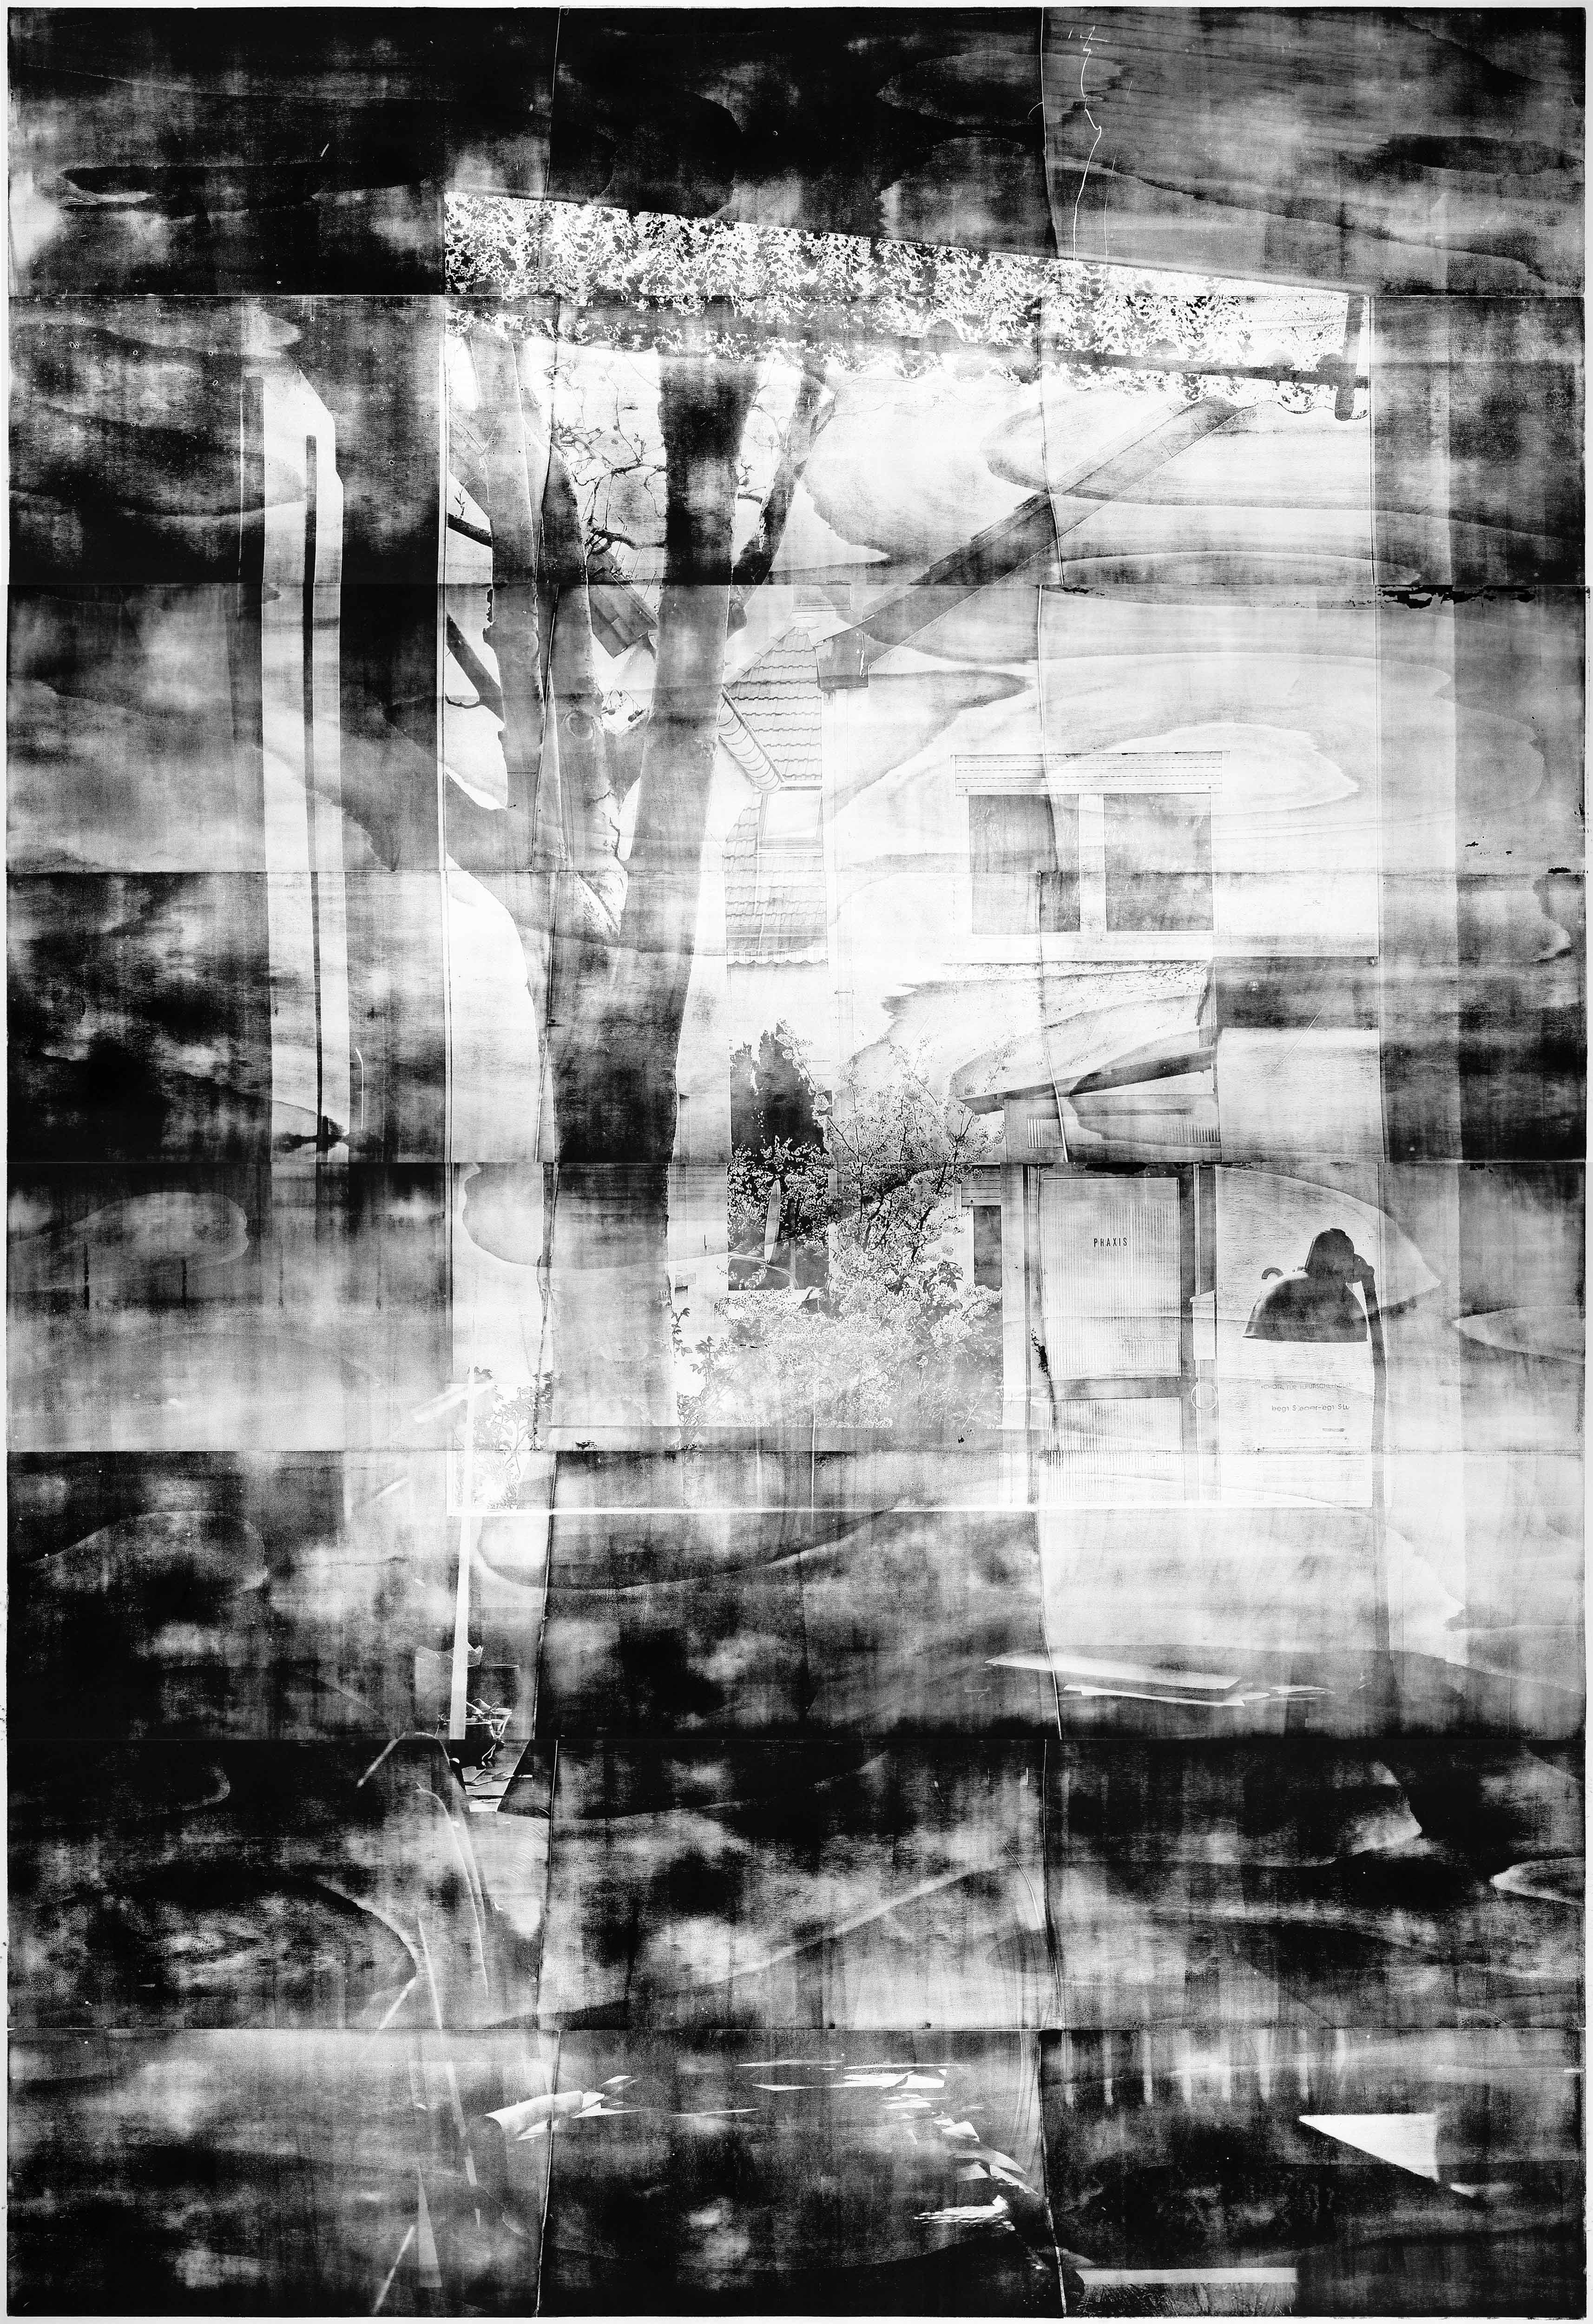 Fenster (Nachmittag), 2019, wood engraving, 382 x 272 cm, Genaro Strobel